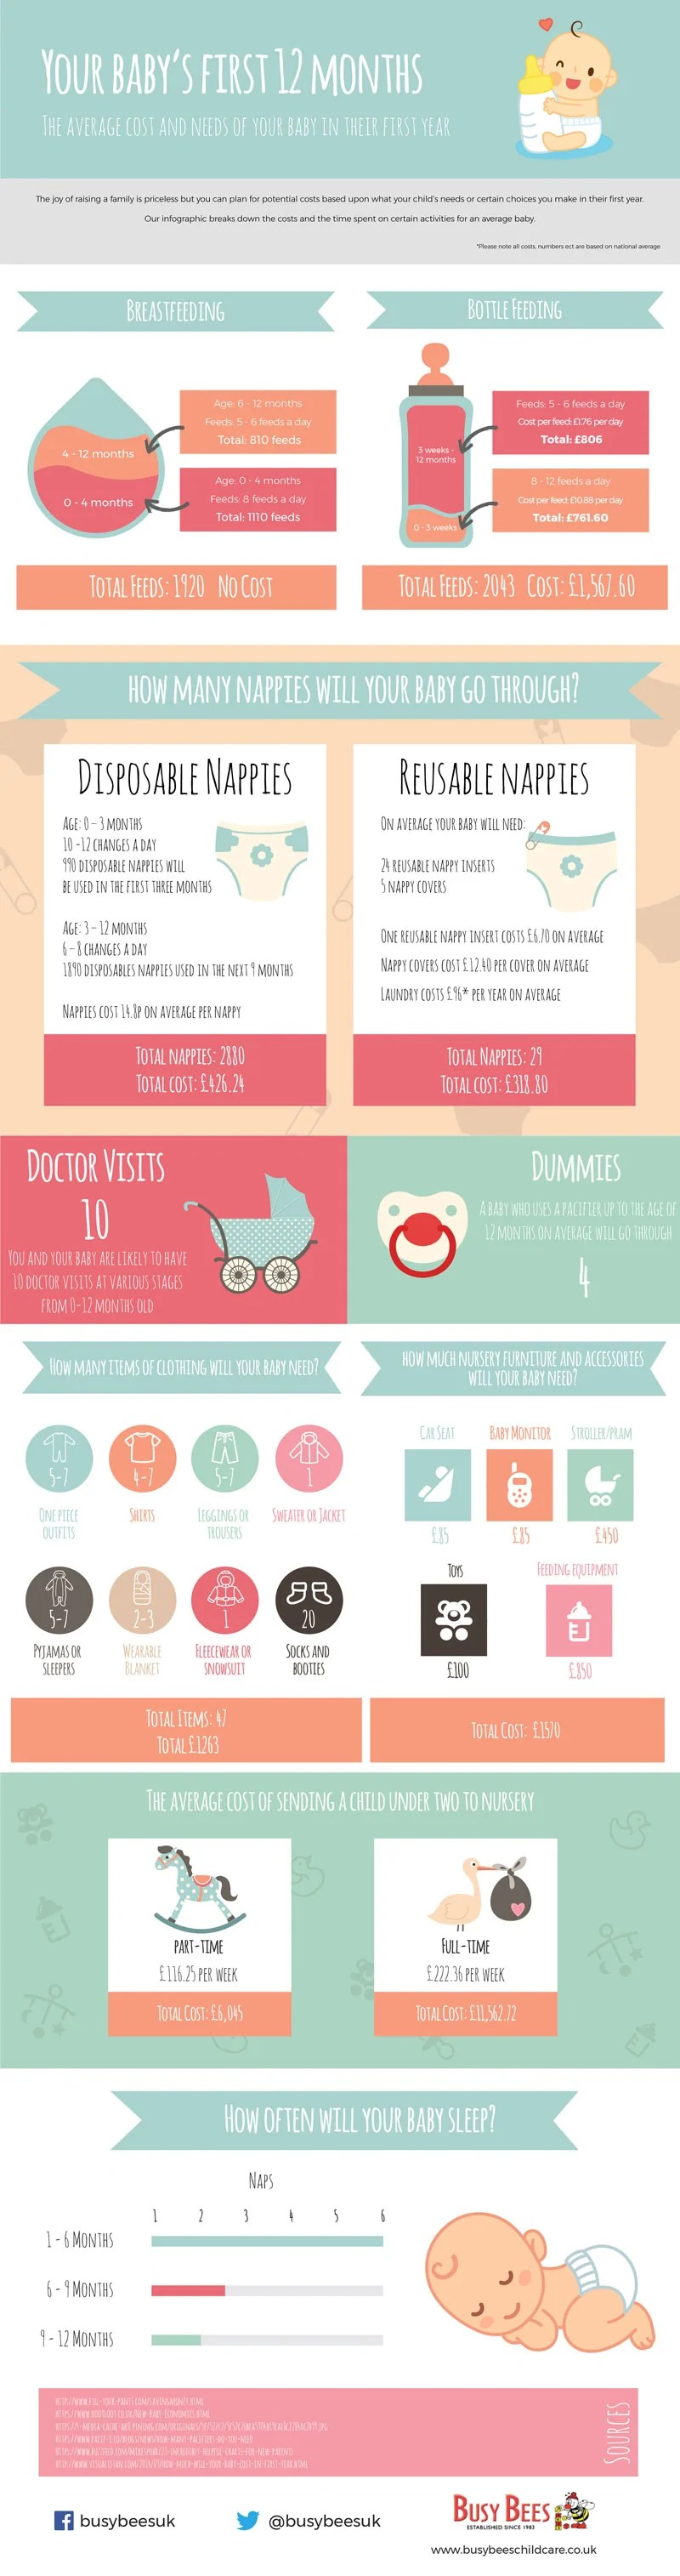 New Baby Infographic